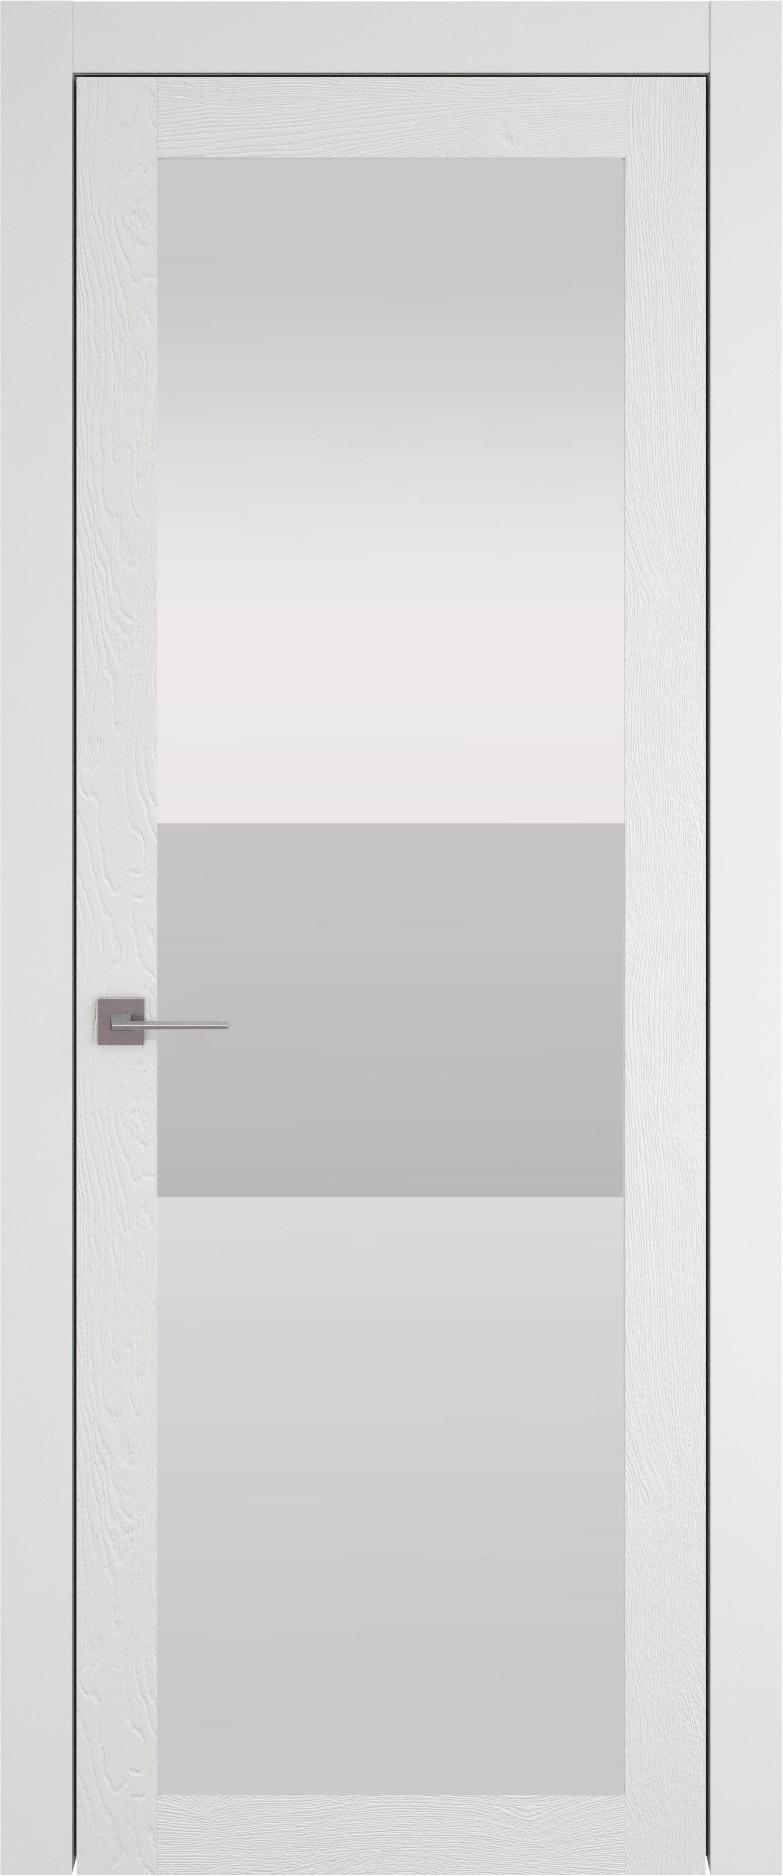 Tivoli З-4 цвет - Белая эмаль по шпону (RAL 9003) Со стеклом (ДО)